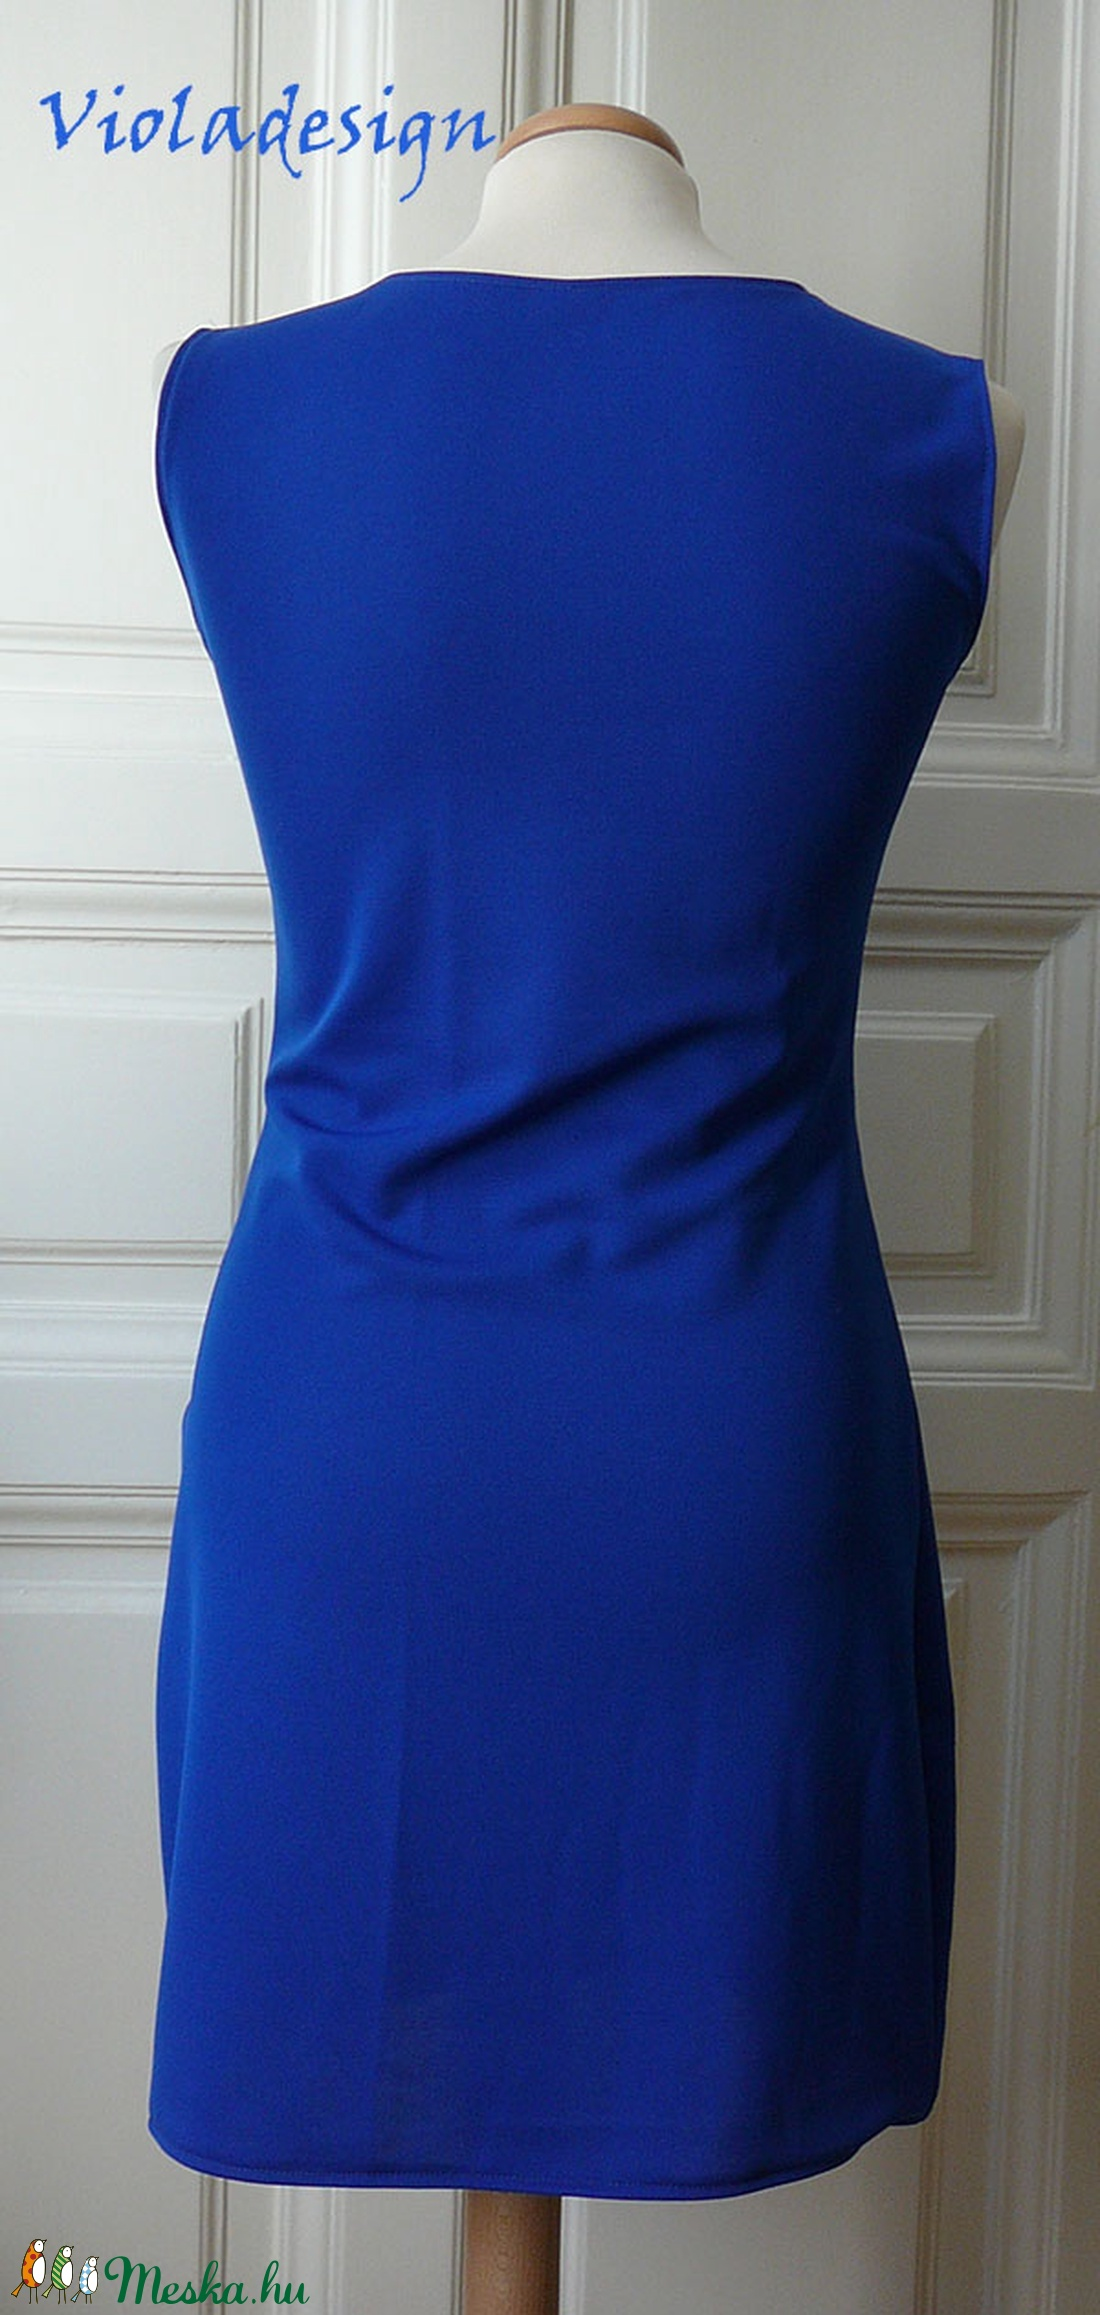 Blue Dream - női egész ruha - ruha & divat - női ruha - ruha - Meska.hu